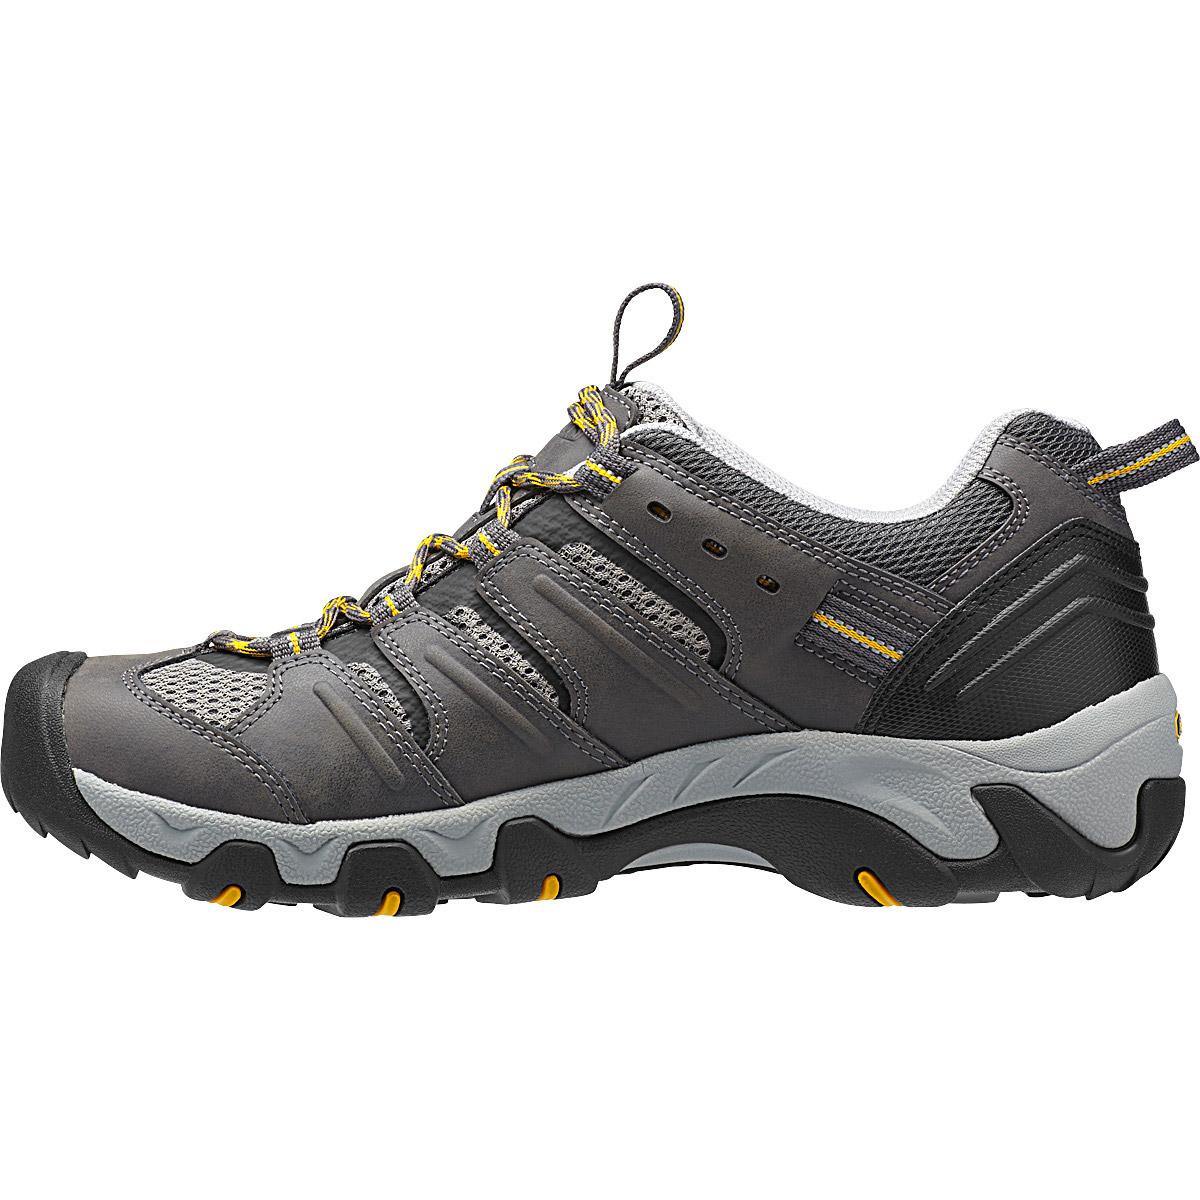 KEEN Men's Koven Hiking Shoes - Eastern